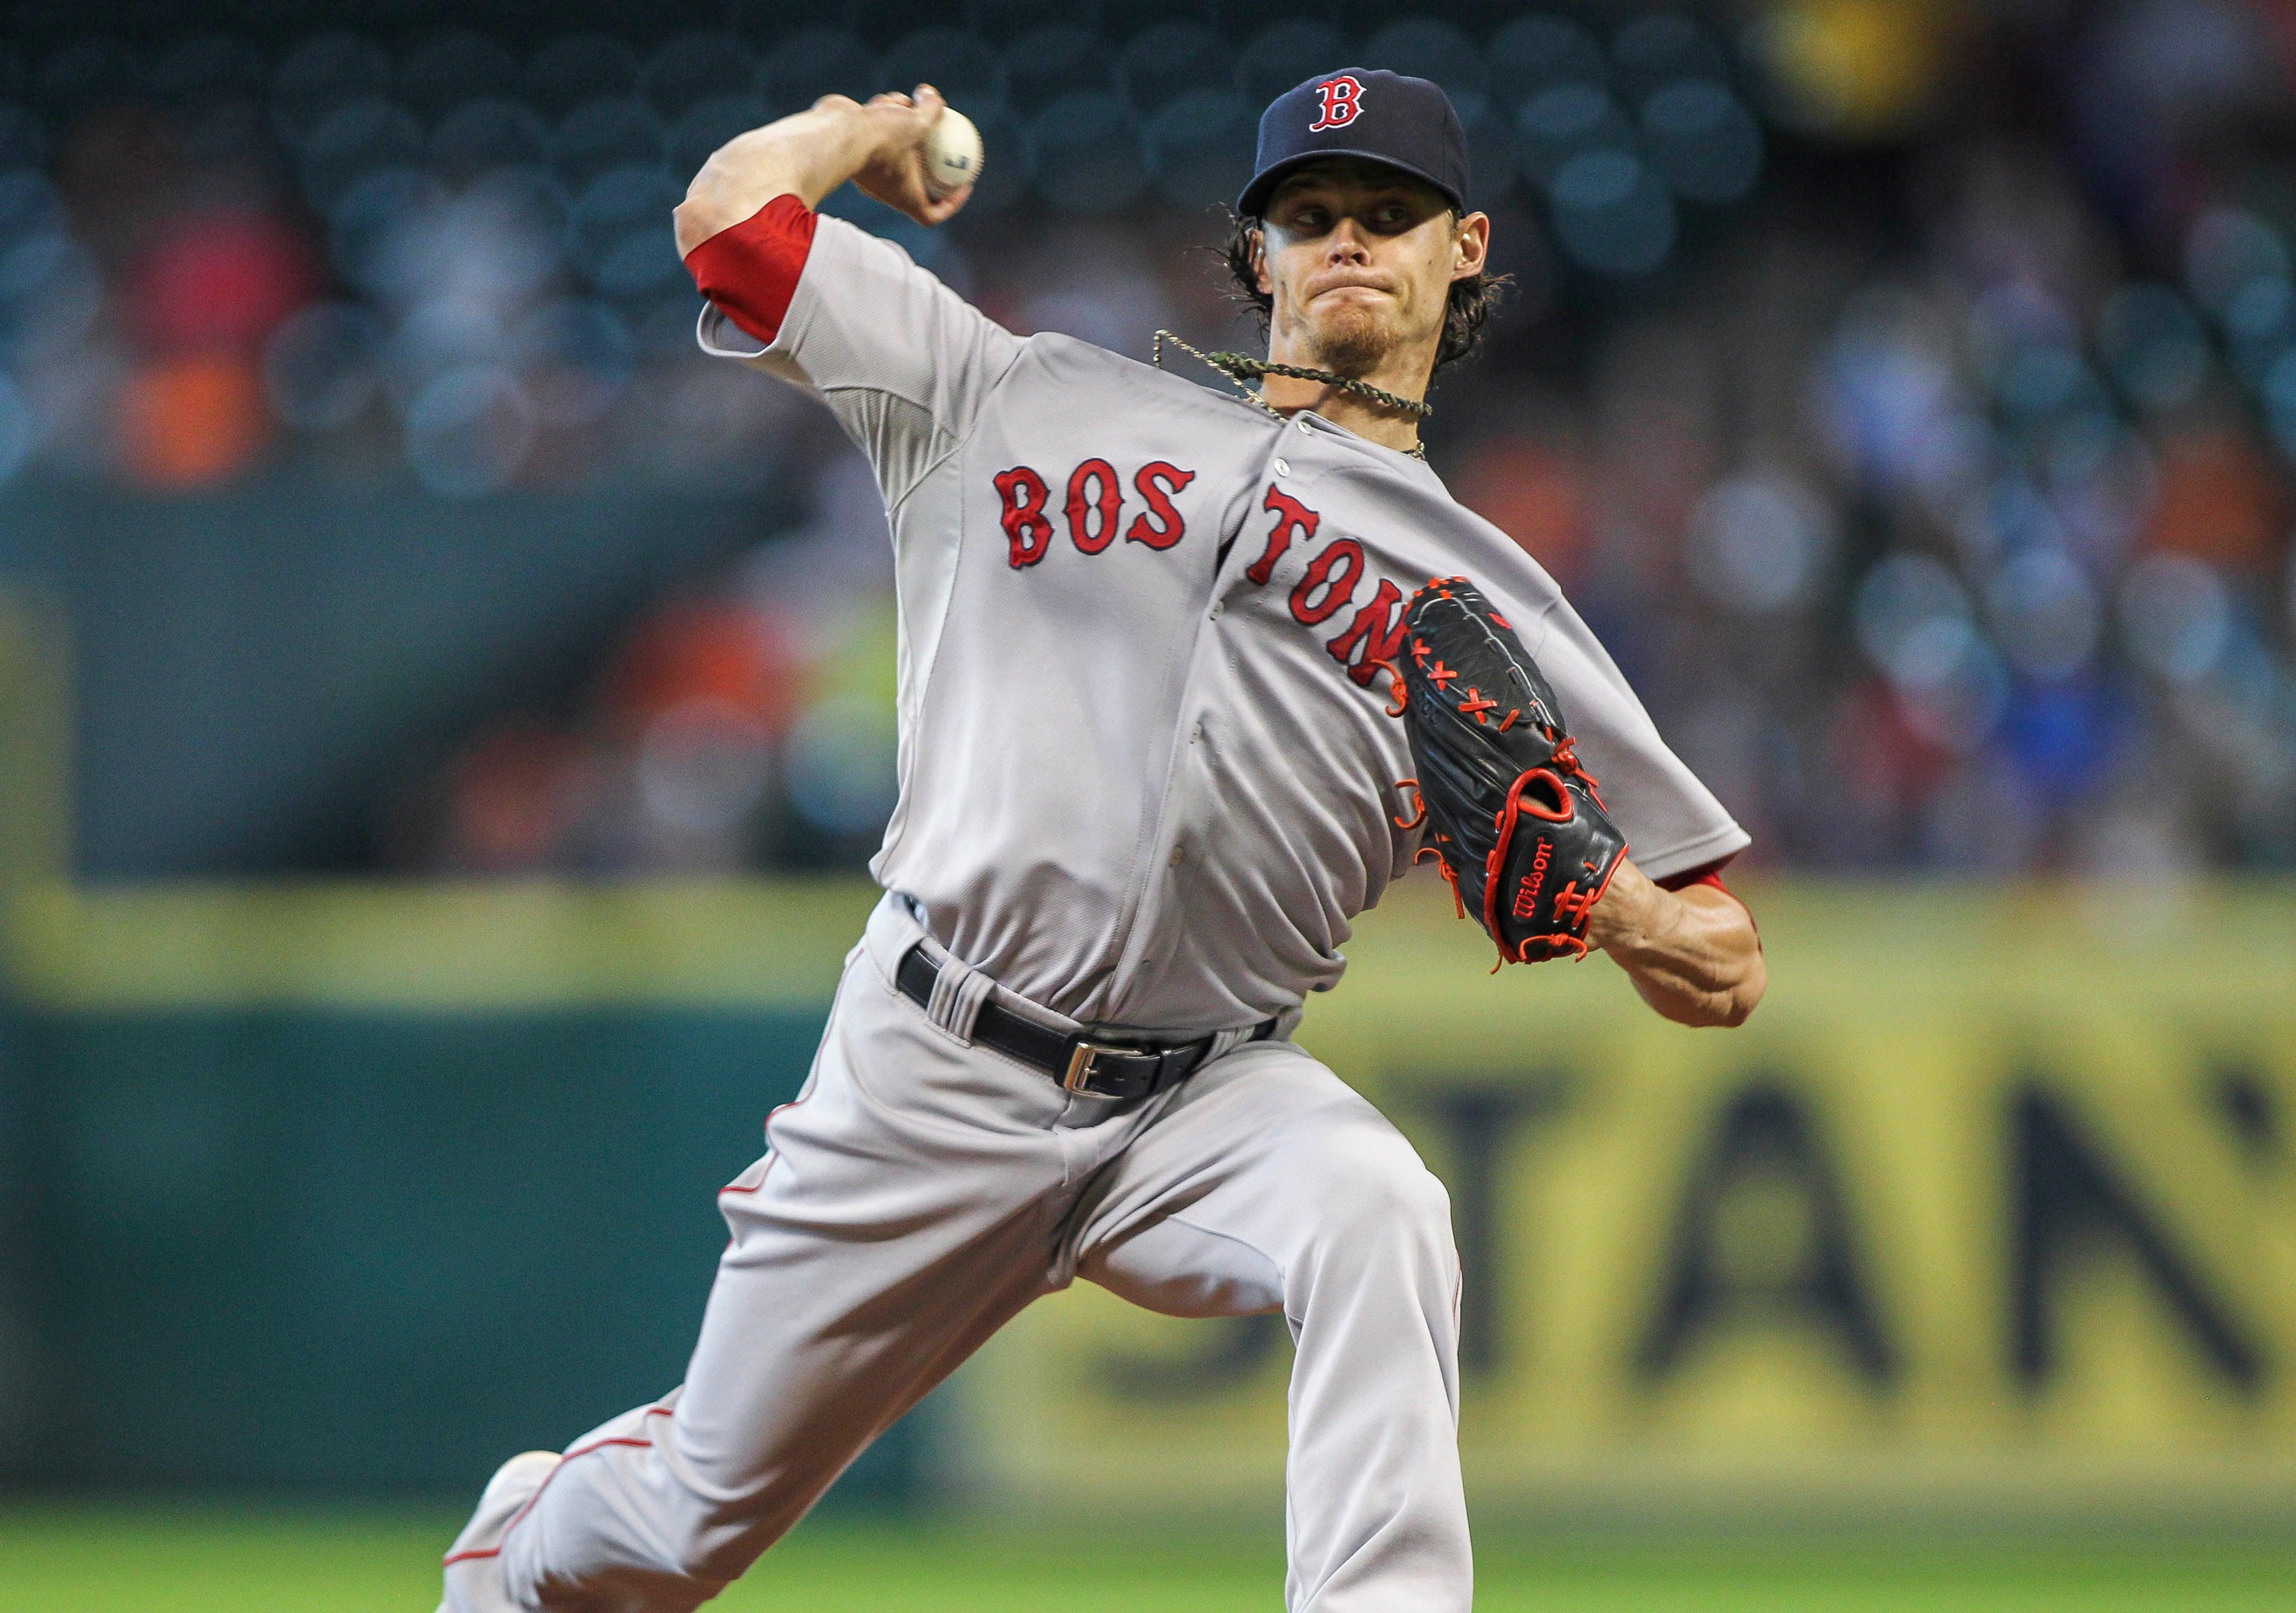 2014-07-13T200701Z_79758002_NOCID_RTRMADP_3_MLB-BOSTON-RED-SOX-AT-HOUSTON-ASTROS.jpg